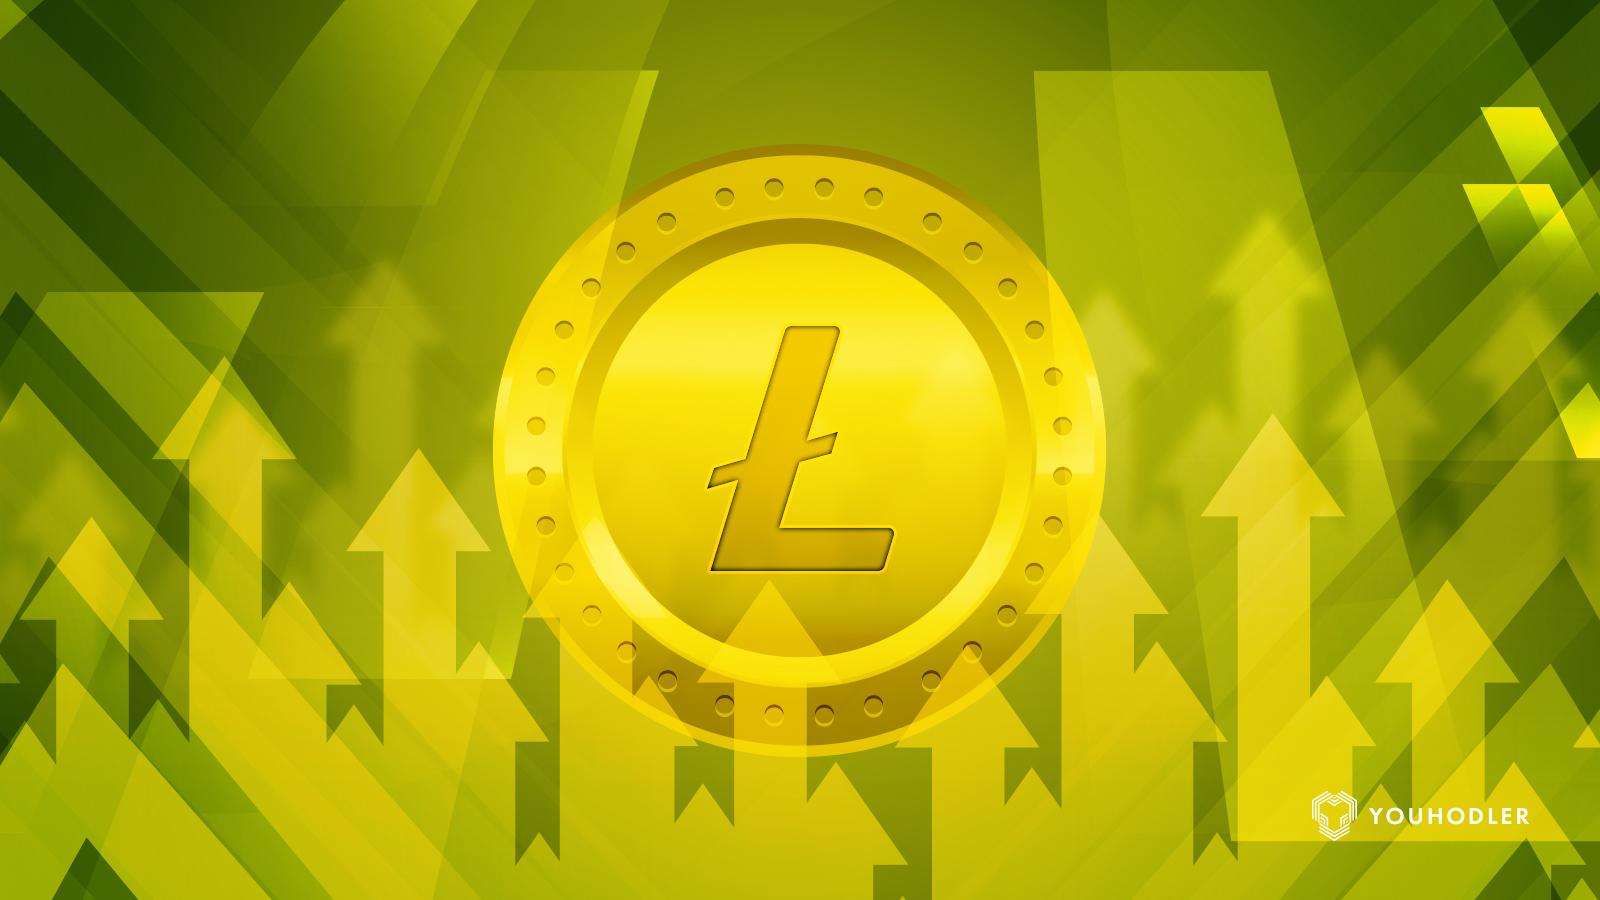 #litecoin loan, LTC lending, LTC credit, Litcoin lending